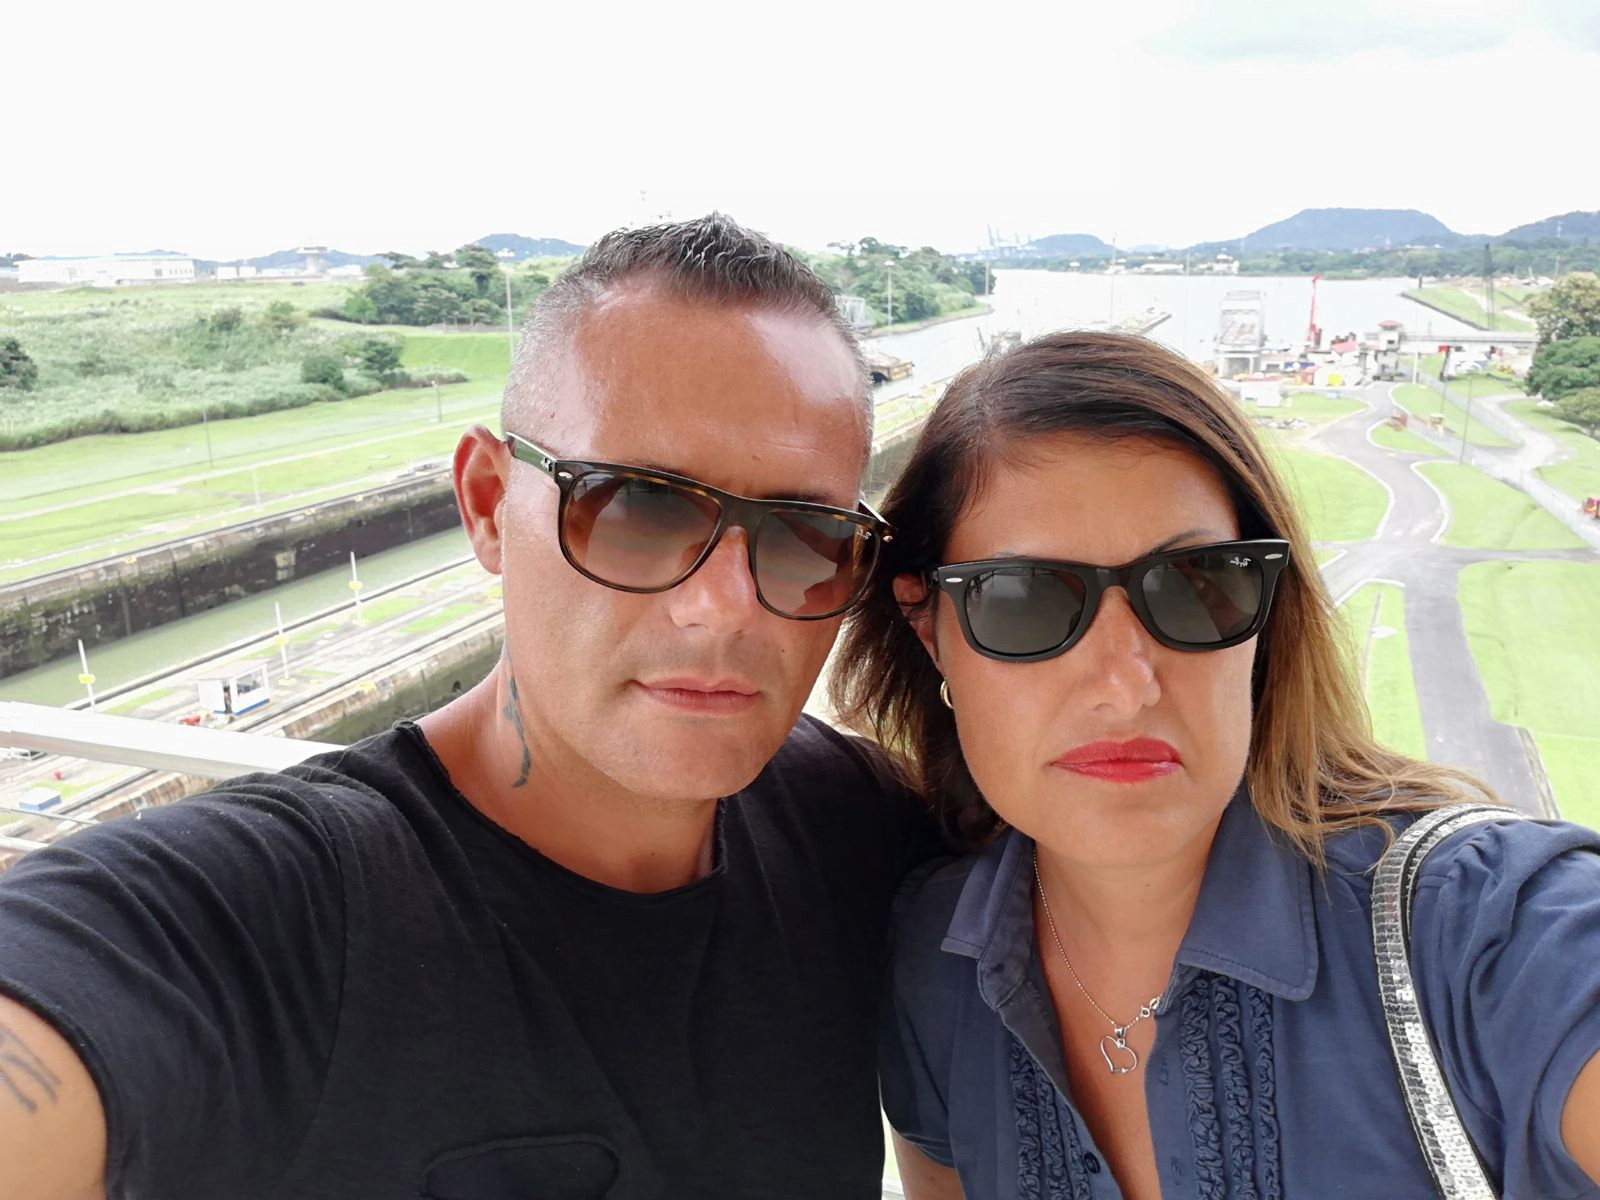 MIRAFLORES CANALE DI PANAMA